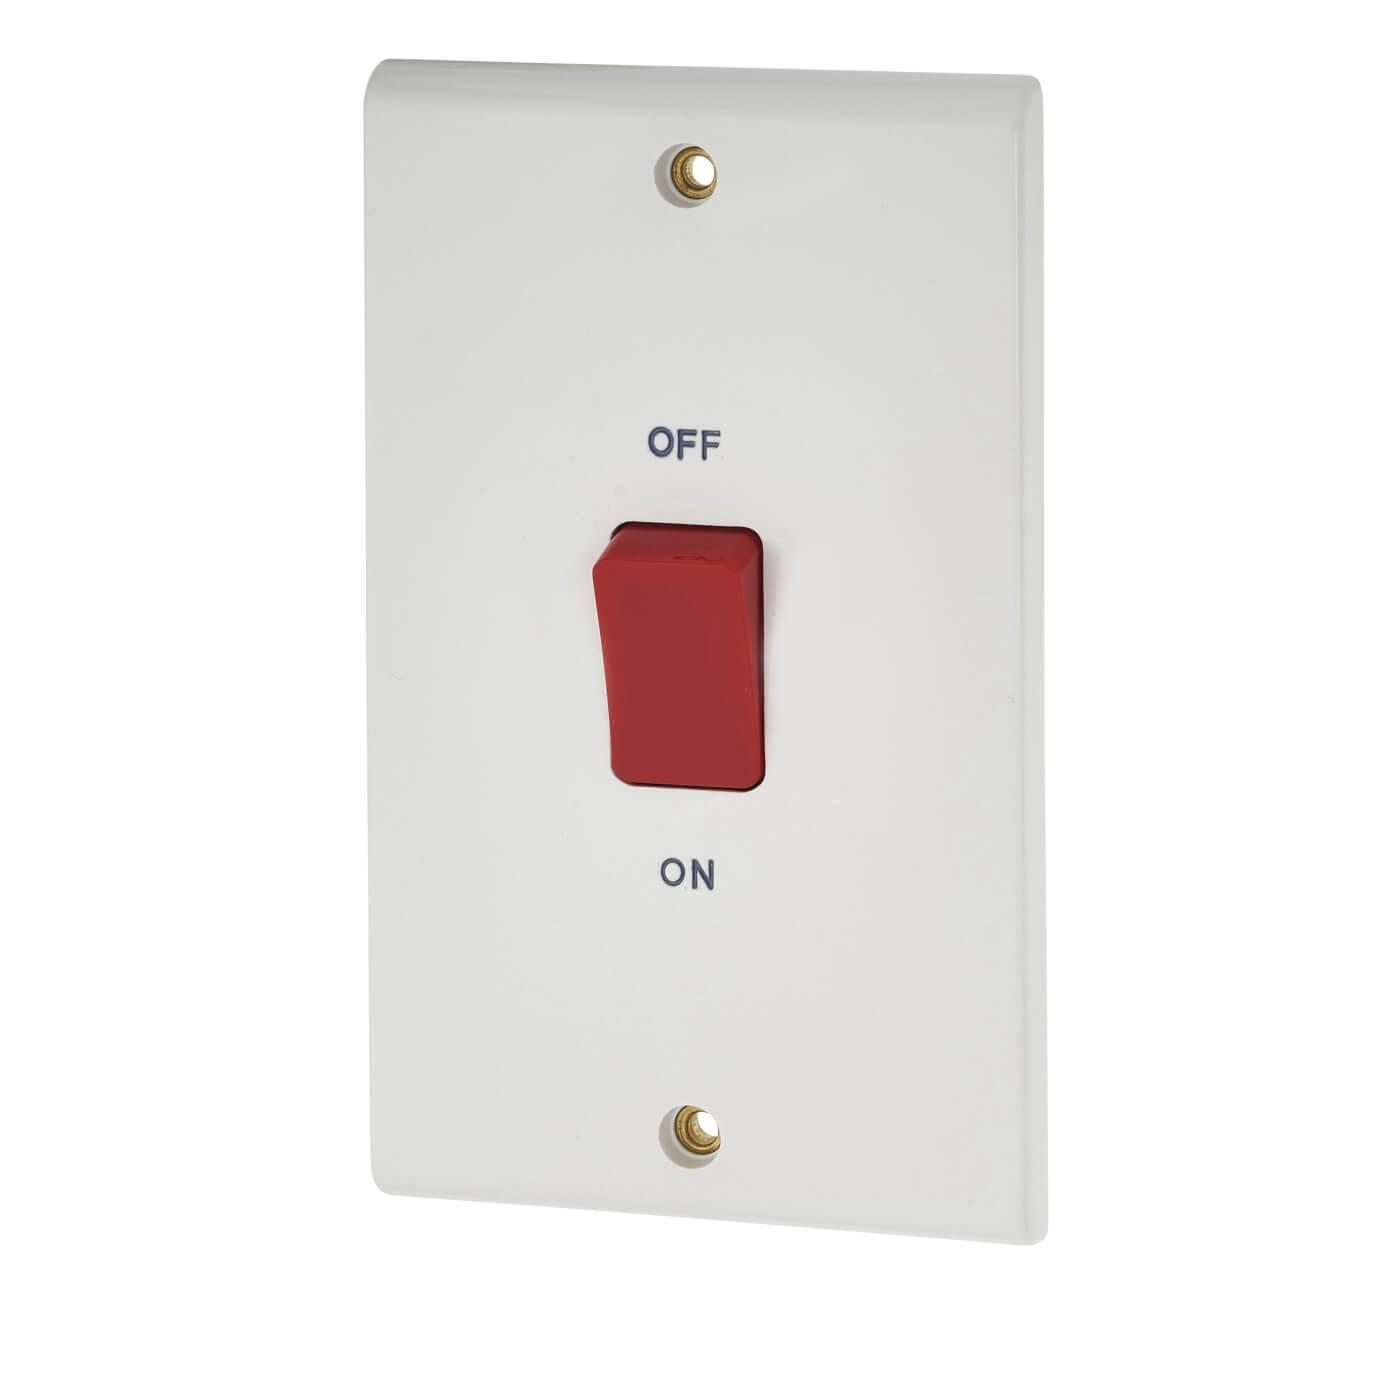 2 gang cooker switch wiring diagram leviton three way dimmer deta 45a white electricaldirect